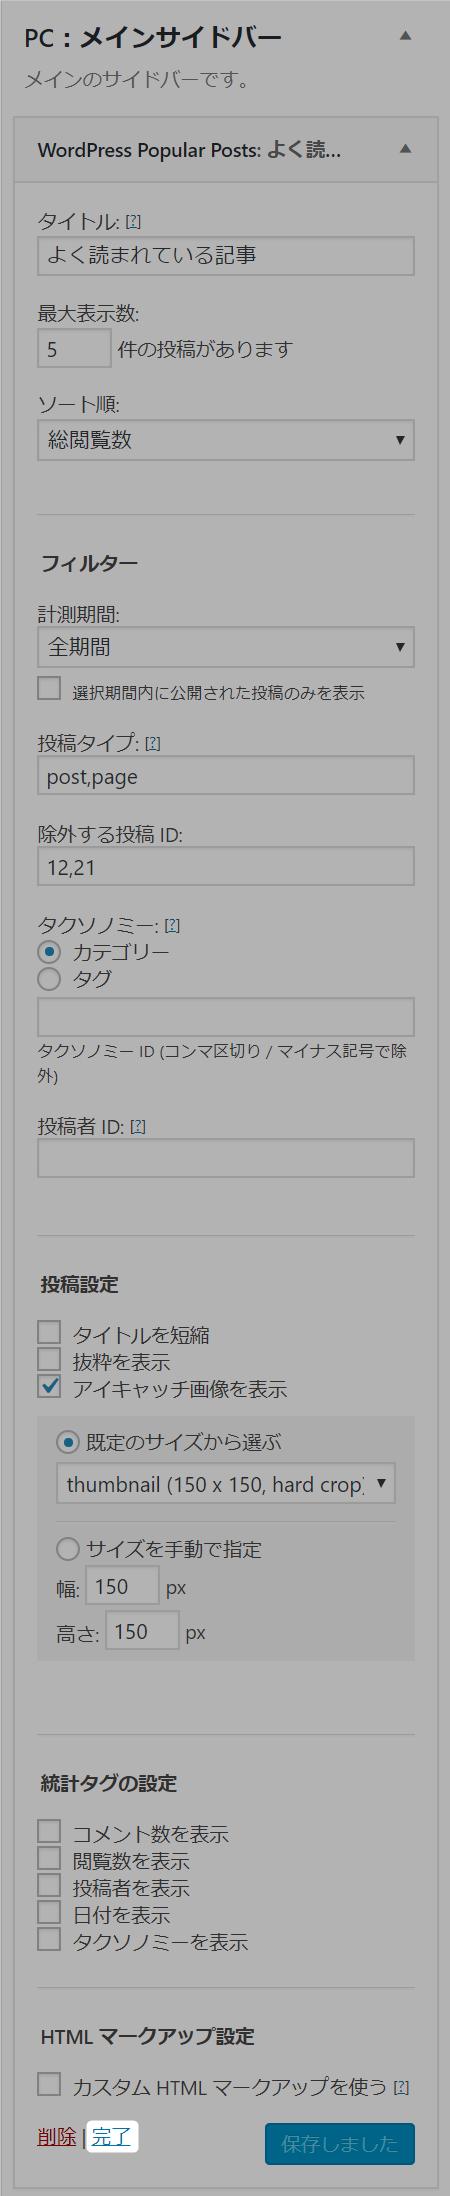 WordpressPopularPosts完了 (2)